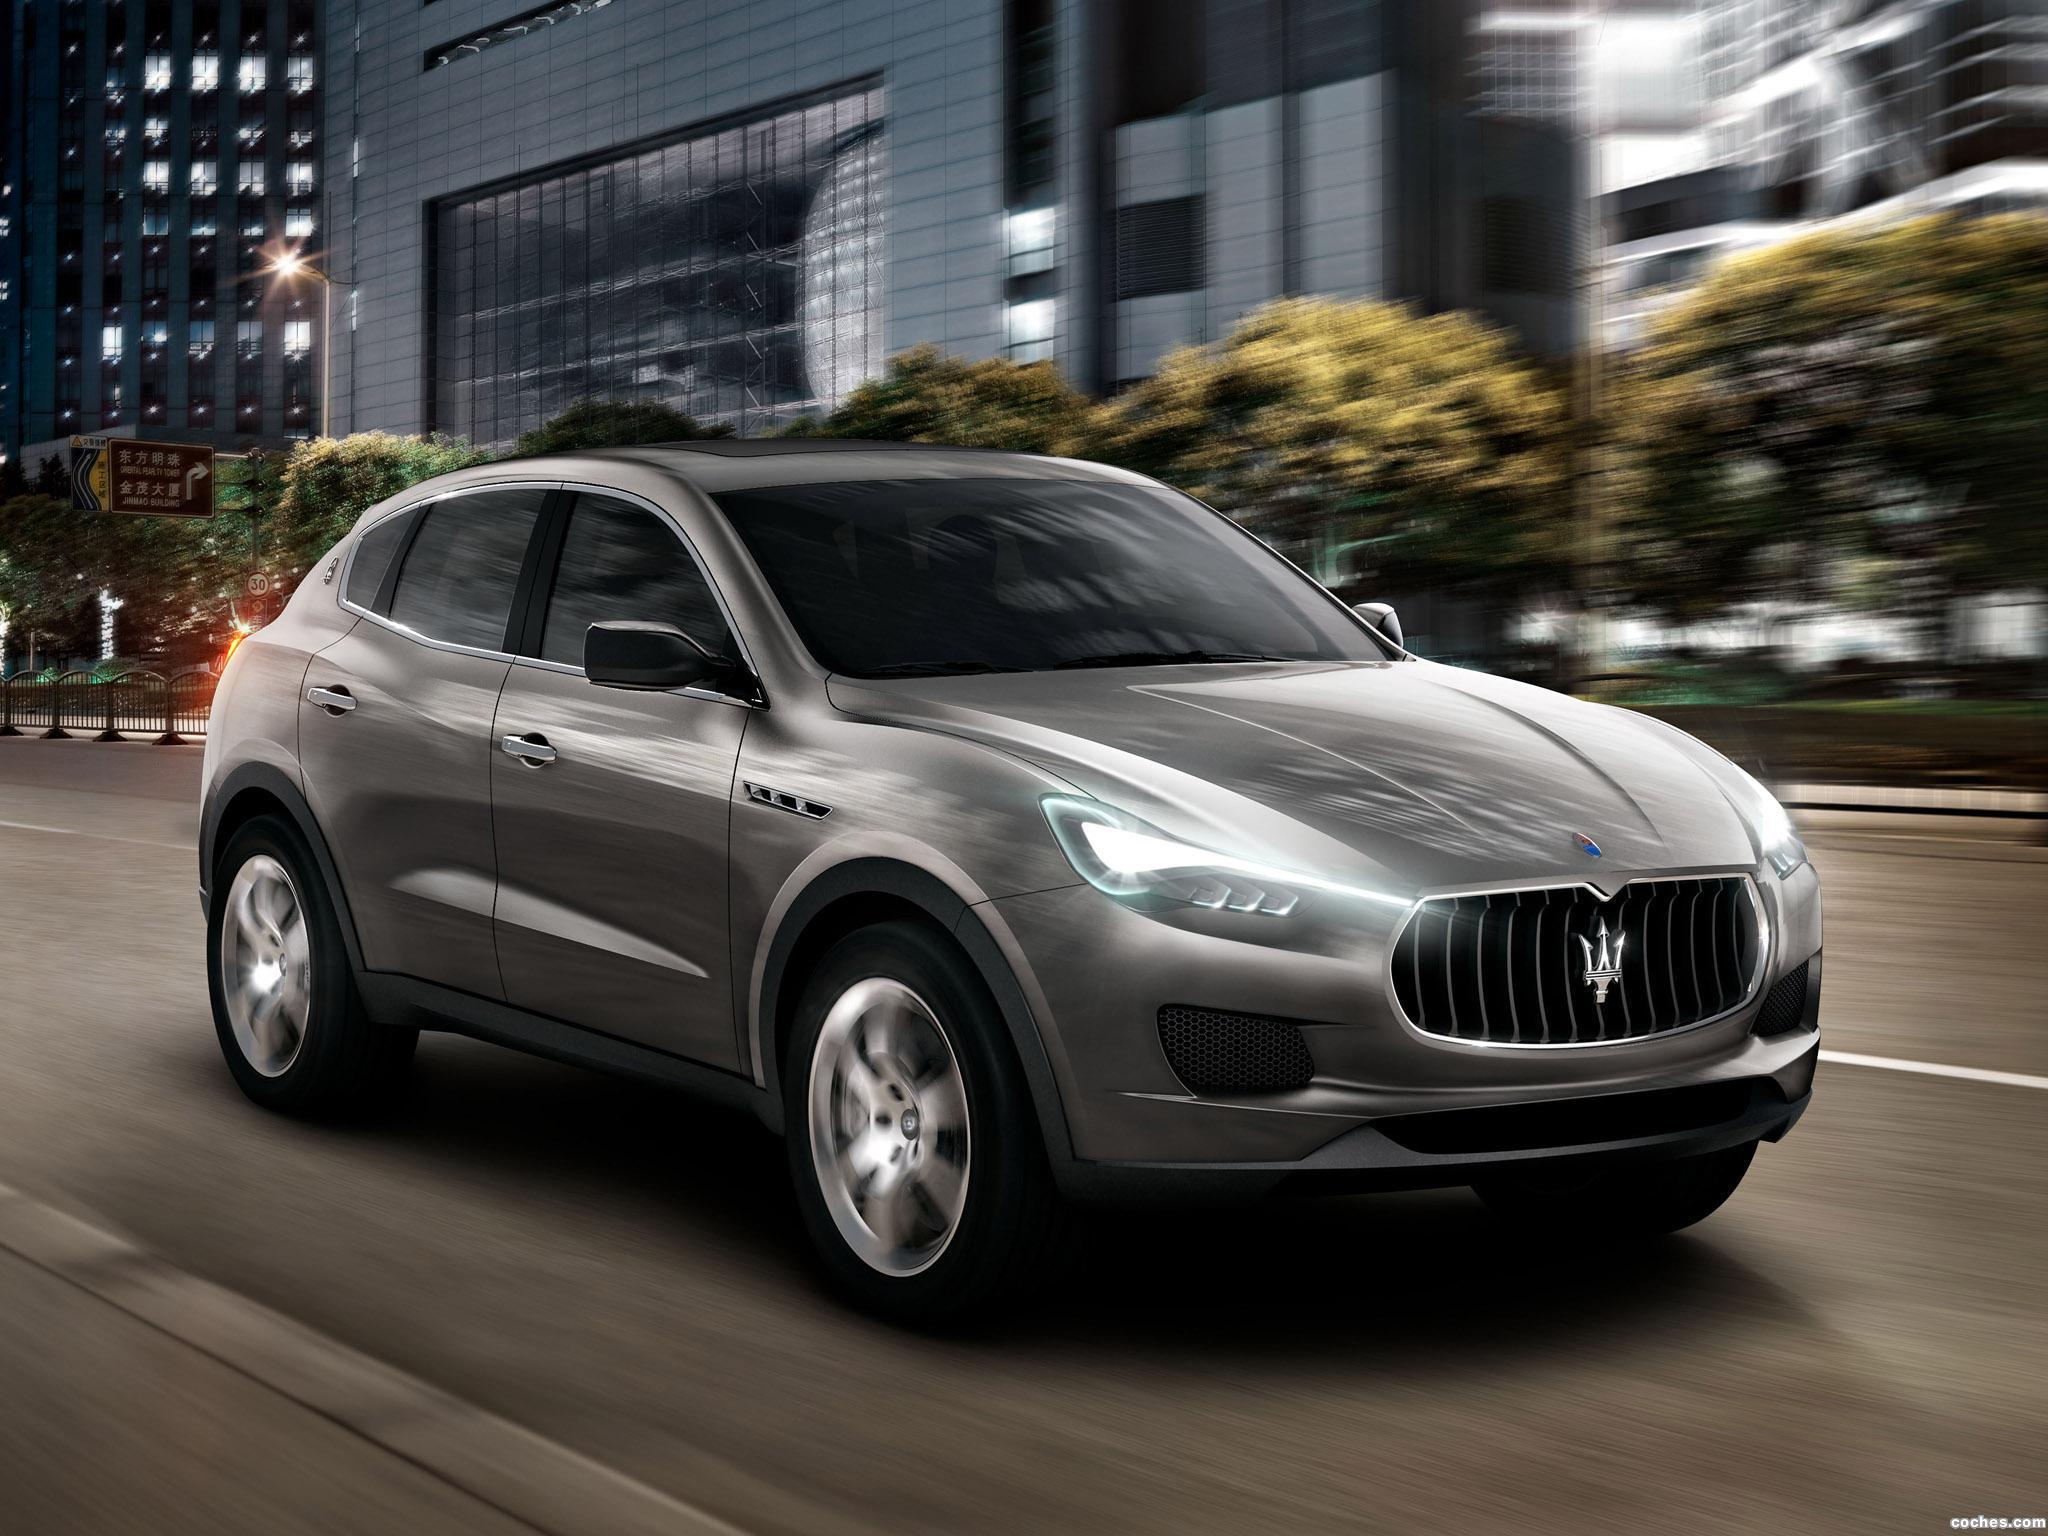 Foto 0 de Maserati Kubang Concept 2011